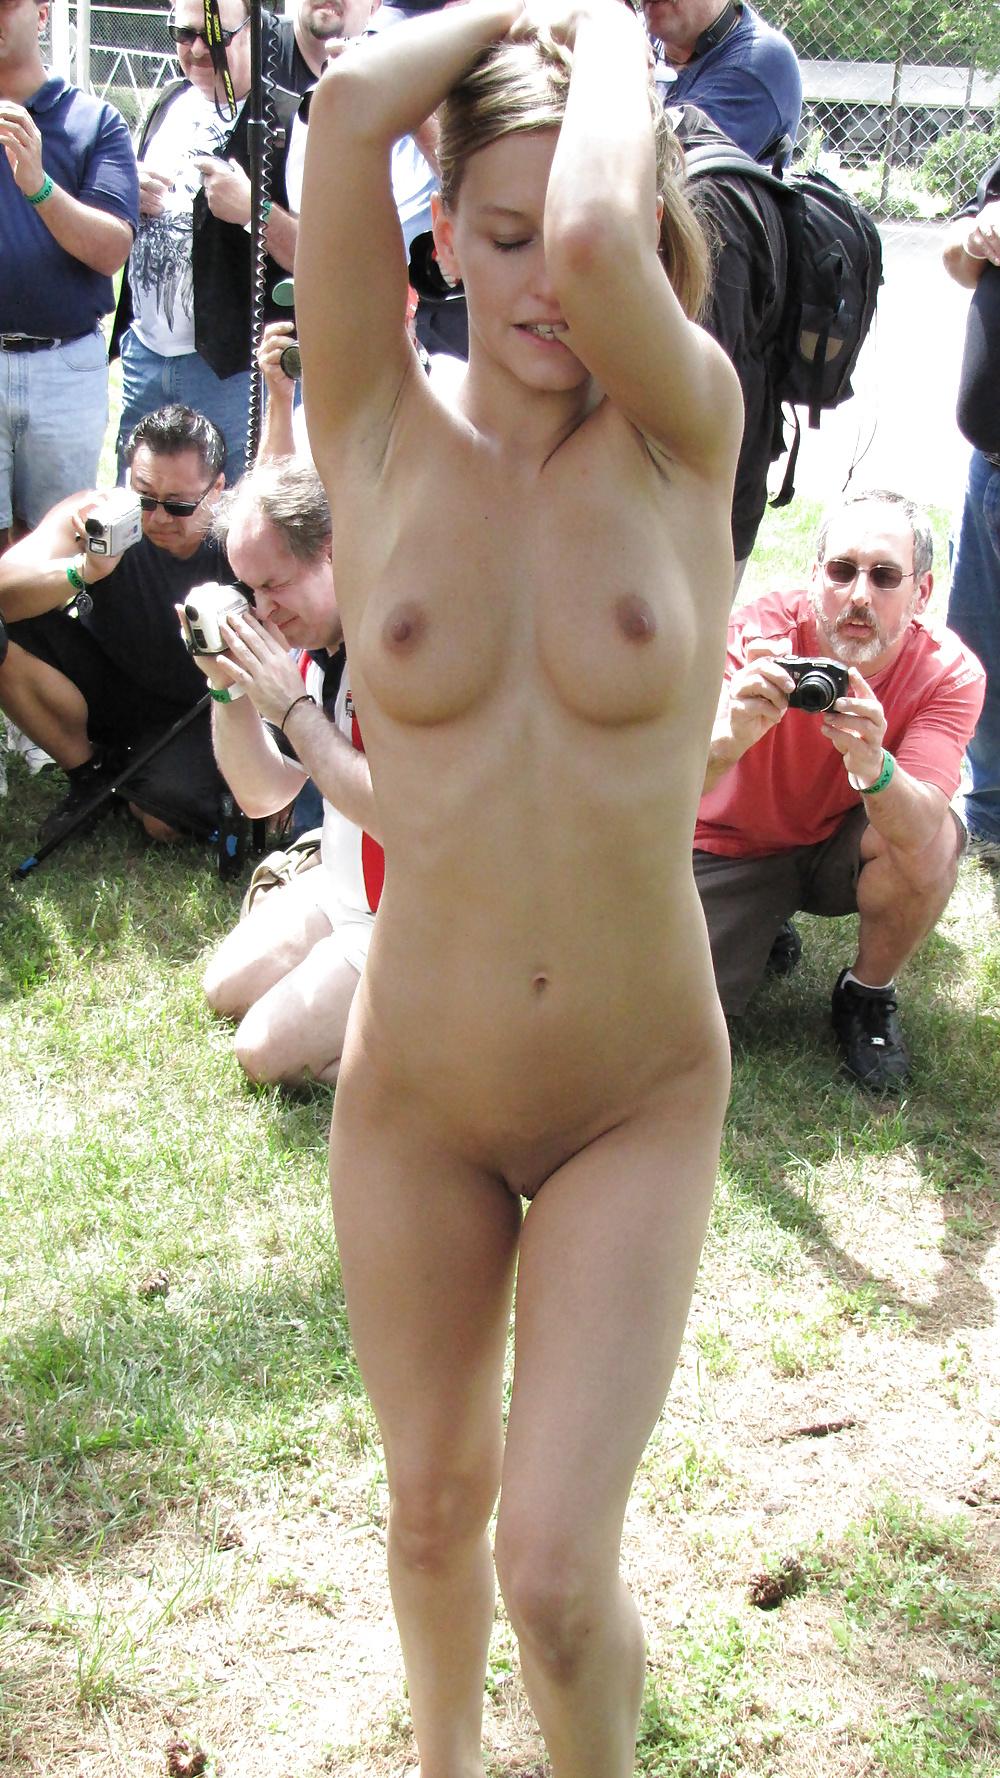 Embarrassed Nude Female Lezdom